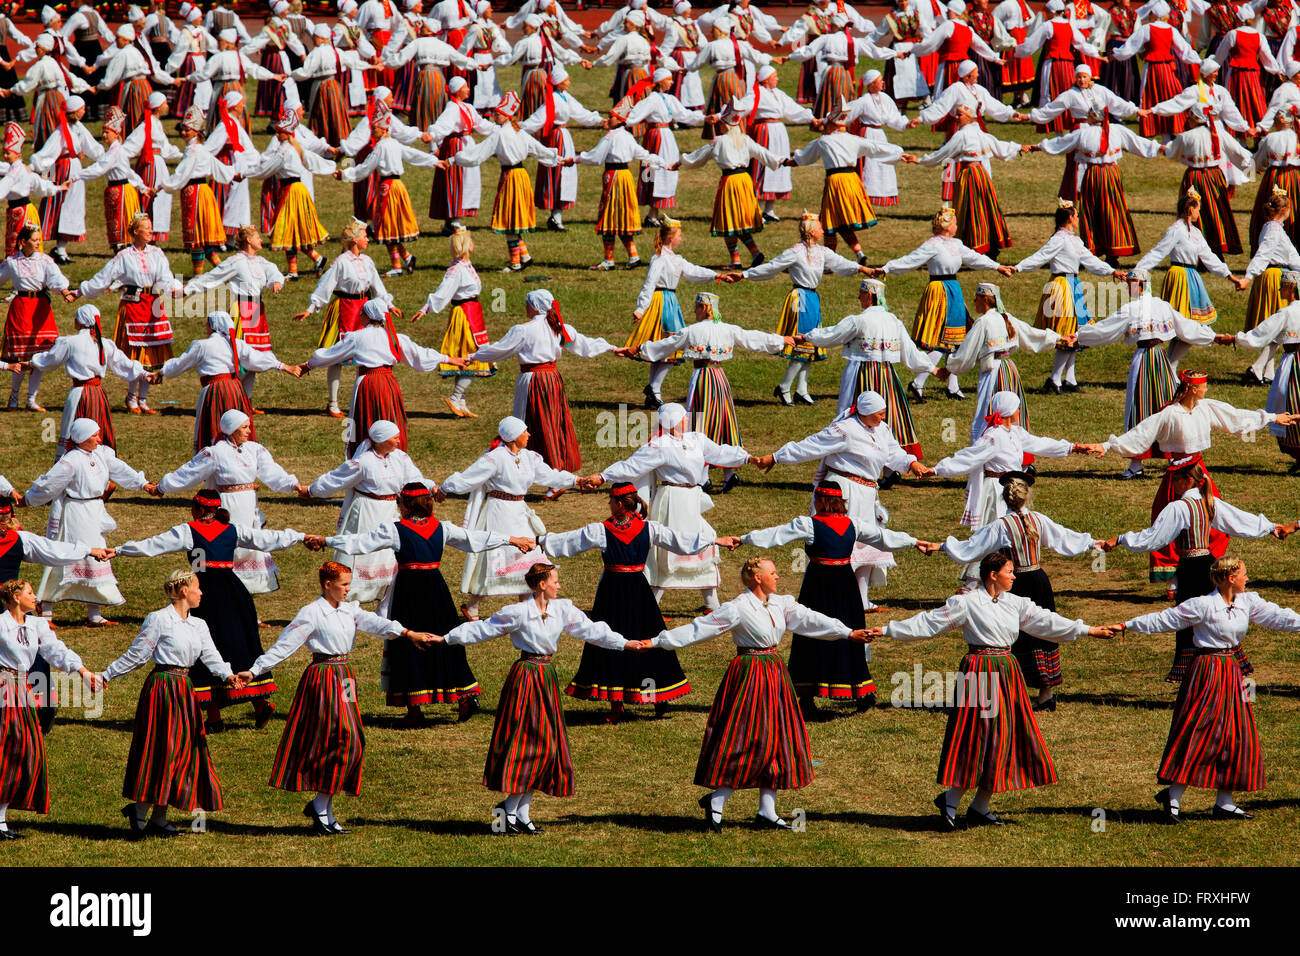 Song and dance festival, Tallinn, Estonia, Baltic States Stock Photo